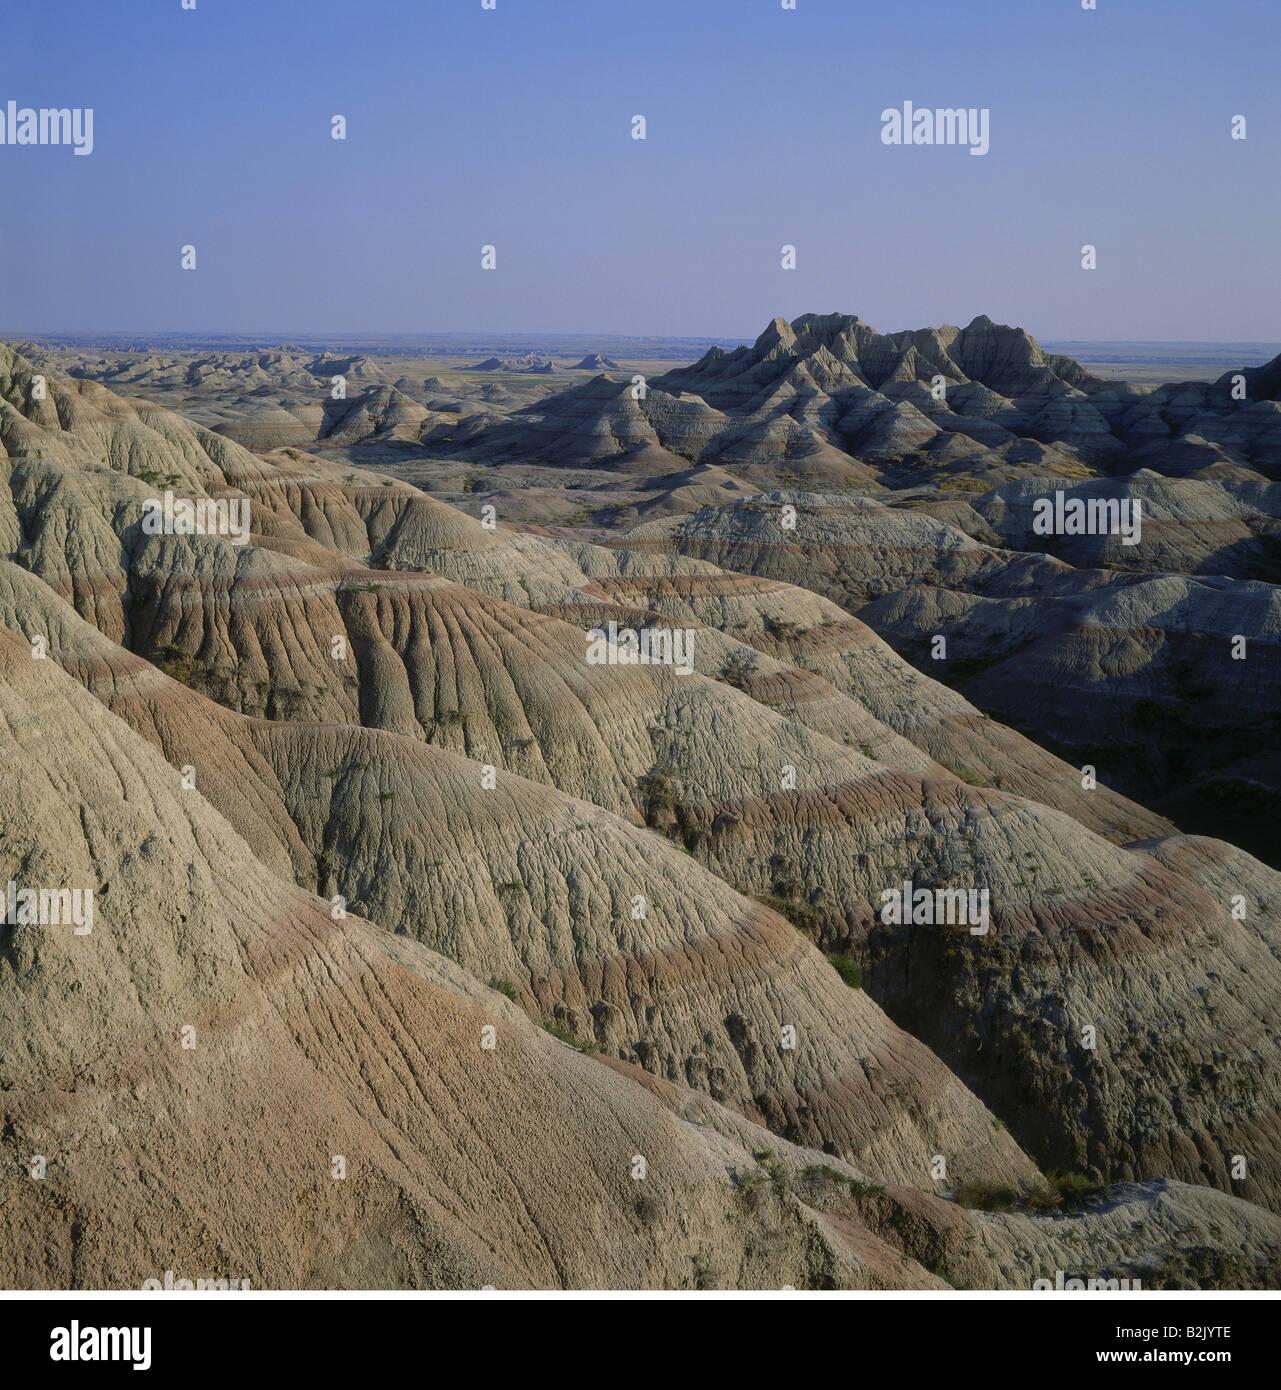 Travel Geography: Big Badlands Overlook Stock Photos & Big Badlands Overlook